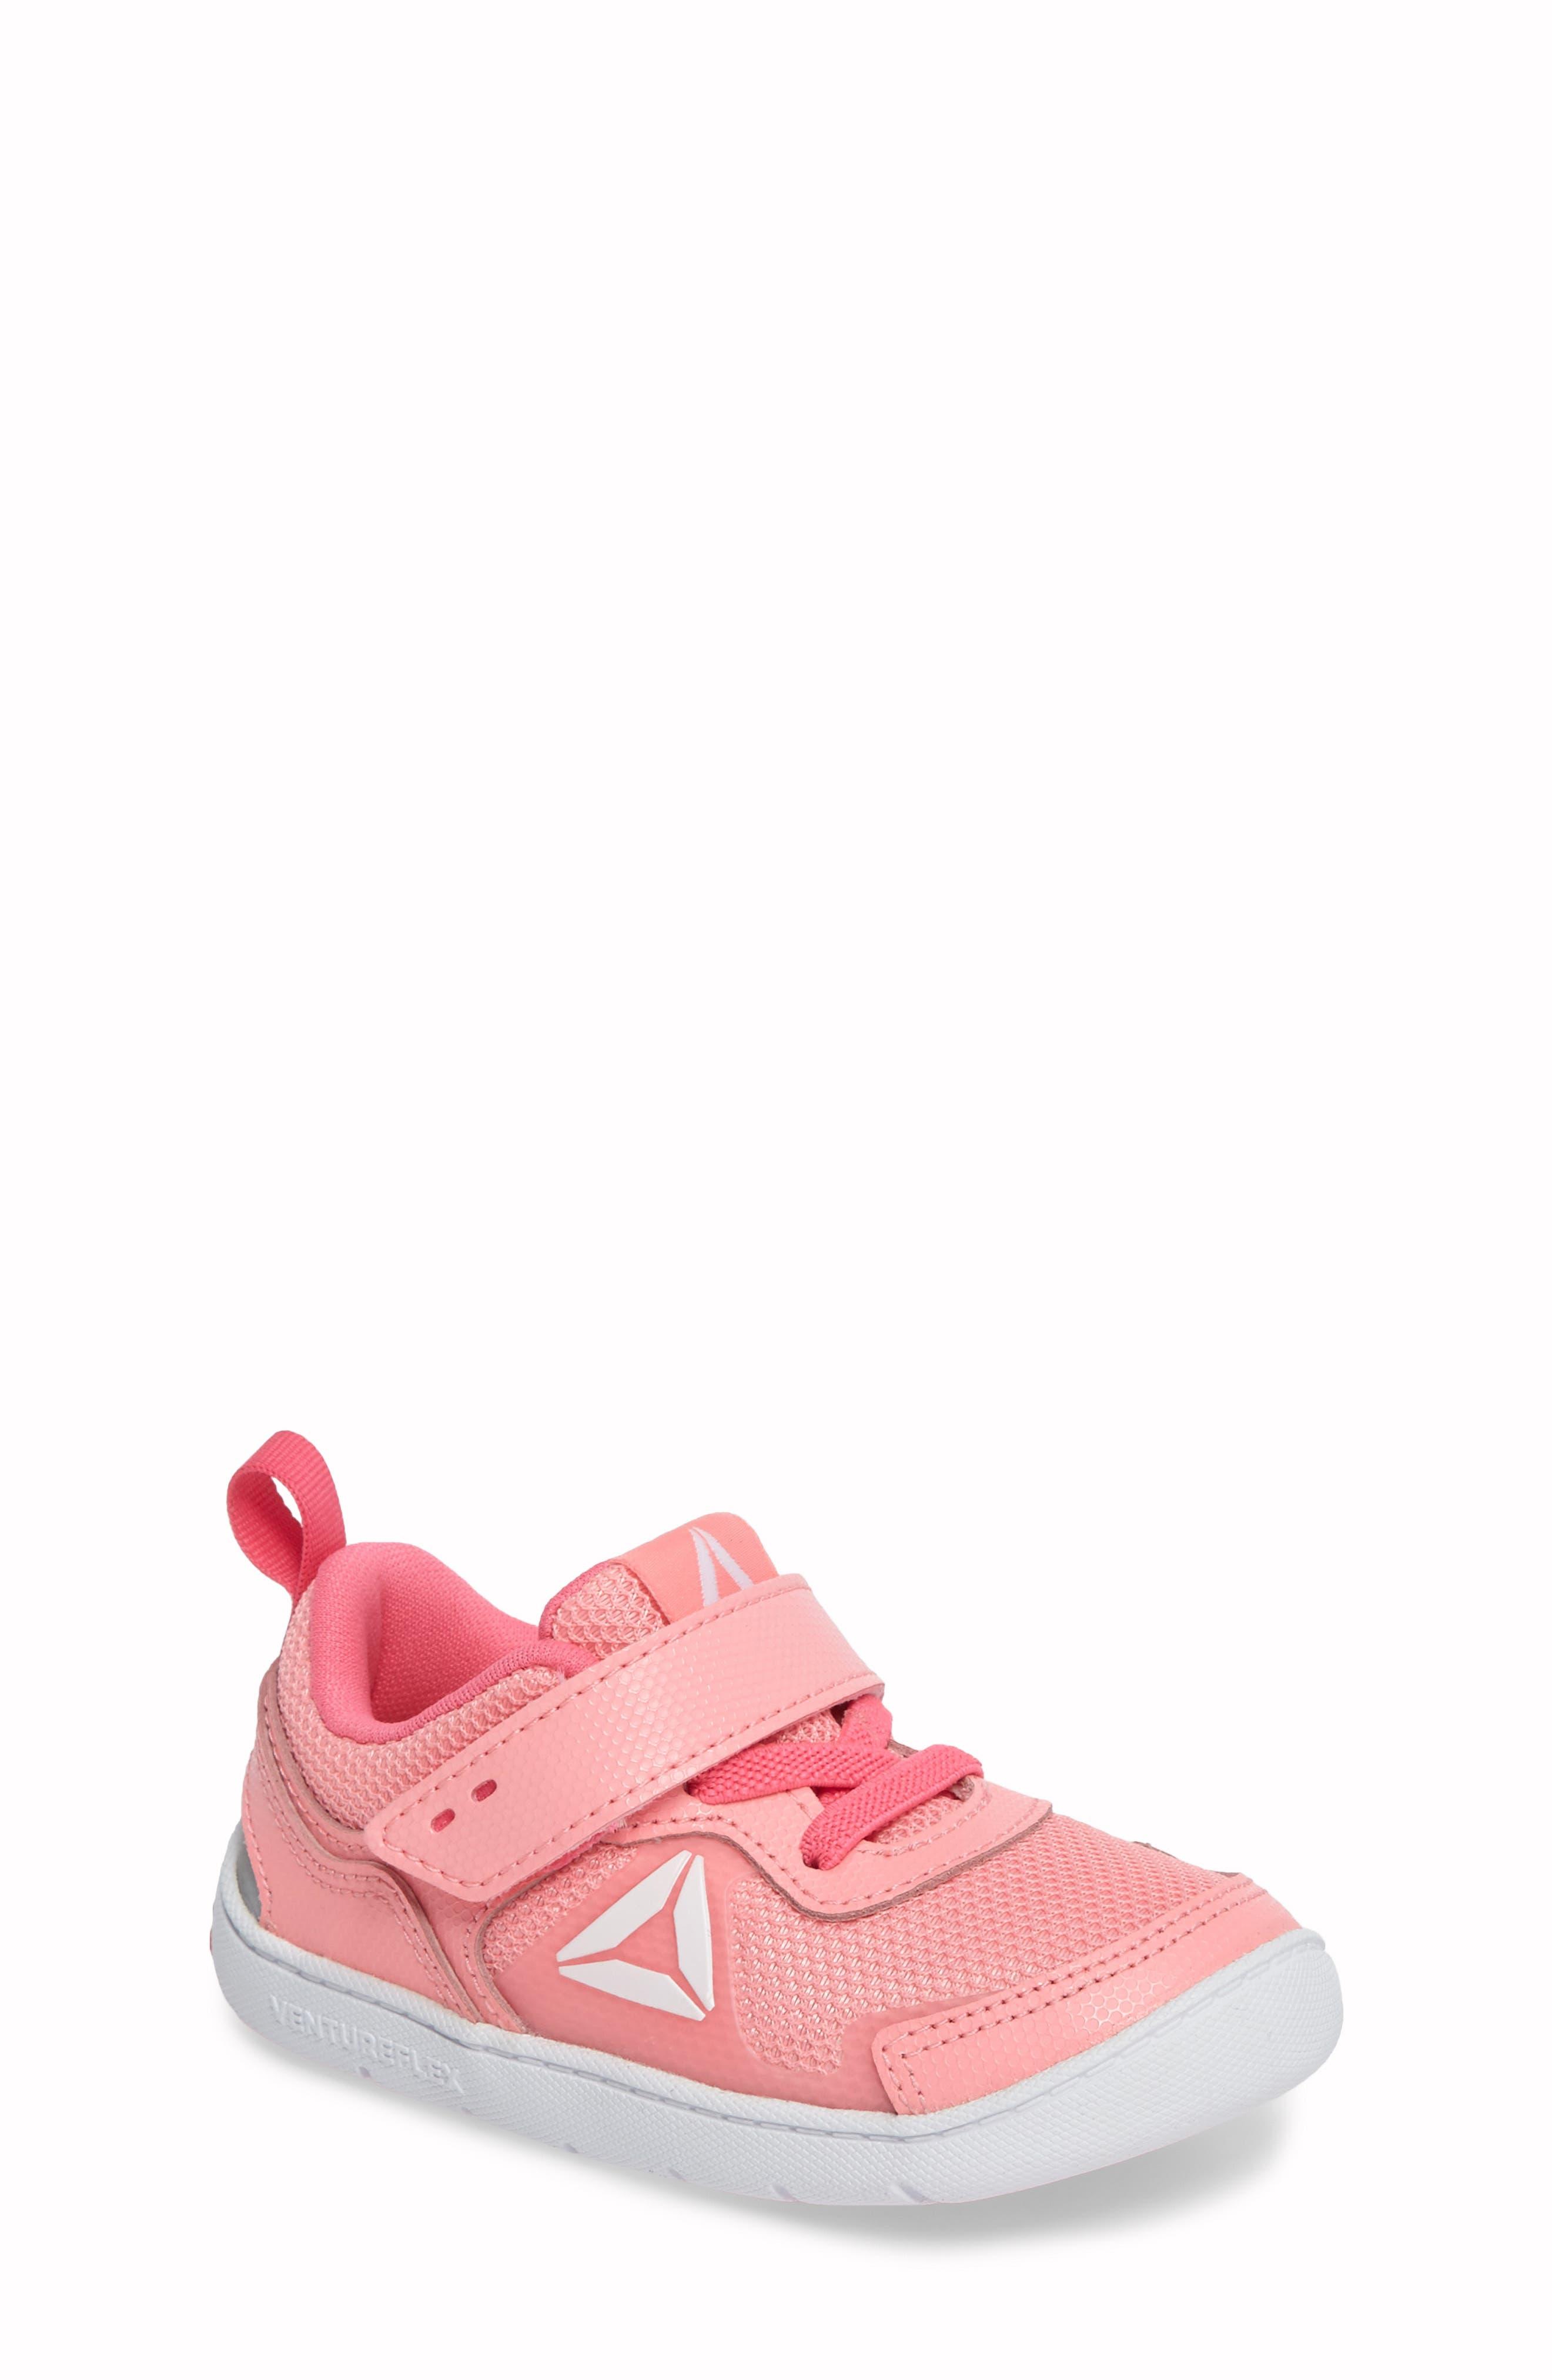 REEBOK Ventureflex Stride 5.0 Sneaker